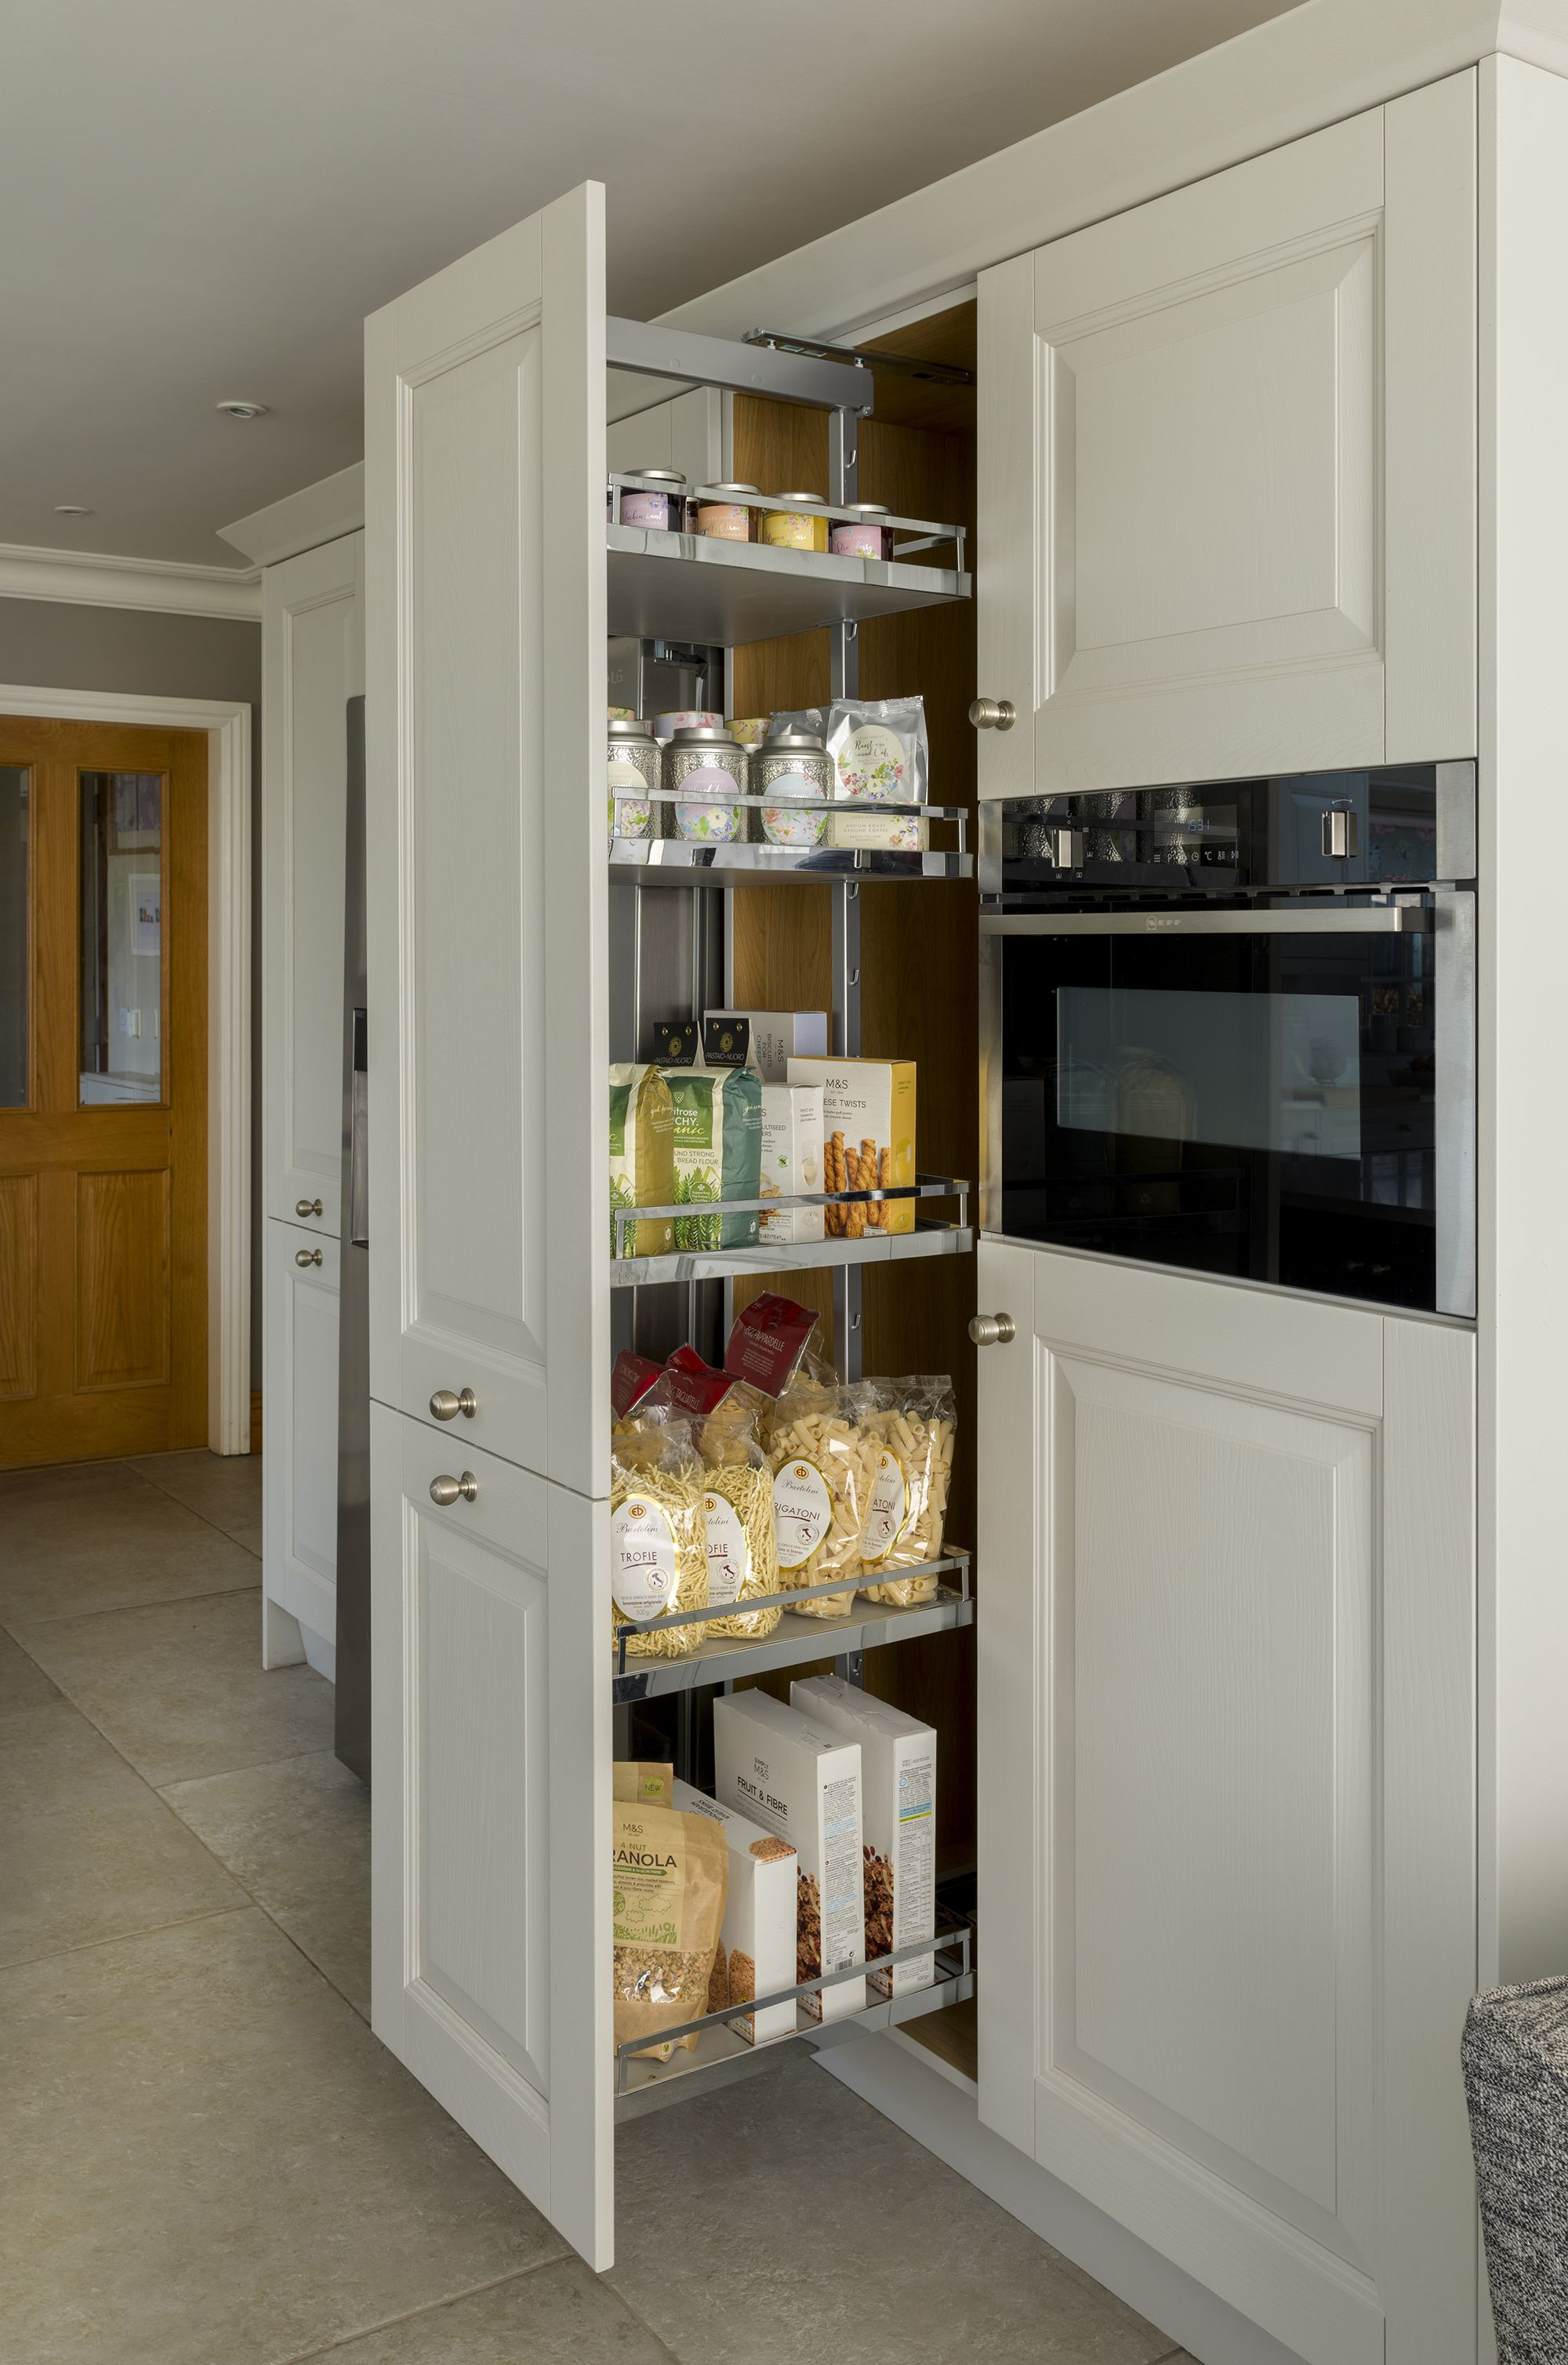 lovely kitchen storage ideas | 33 Lovely DIY Kitchen Storage Ideas To Maximize Kitchen ...